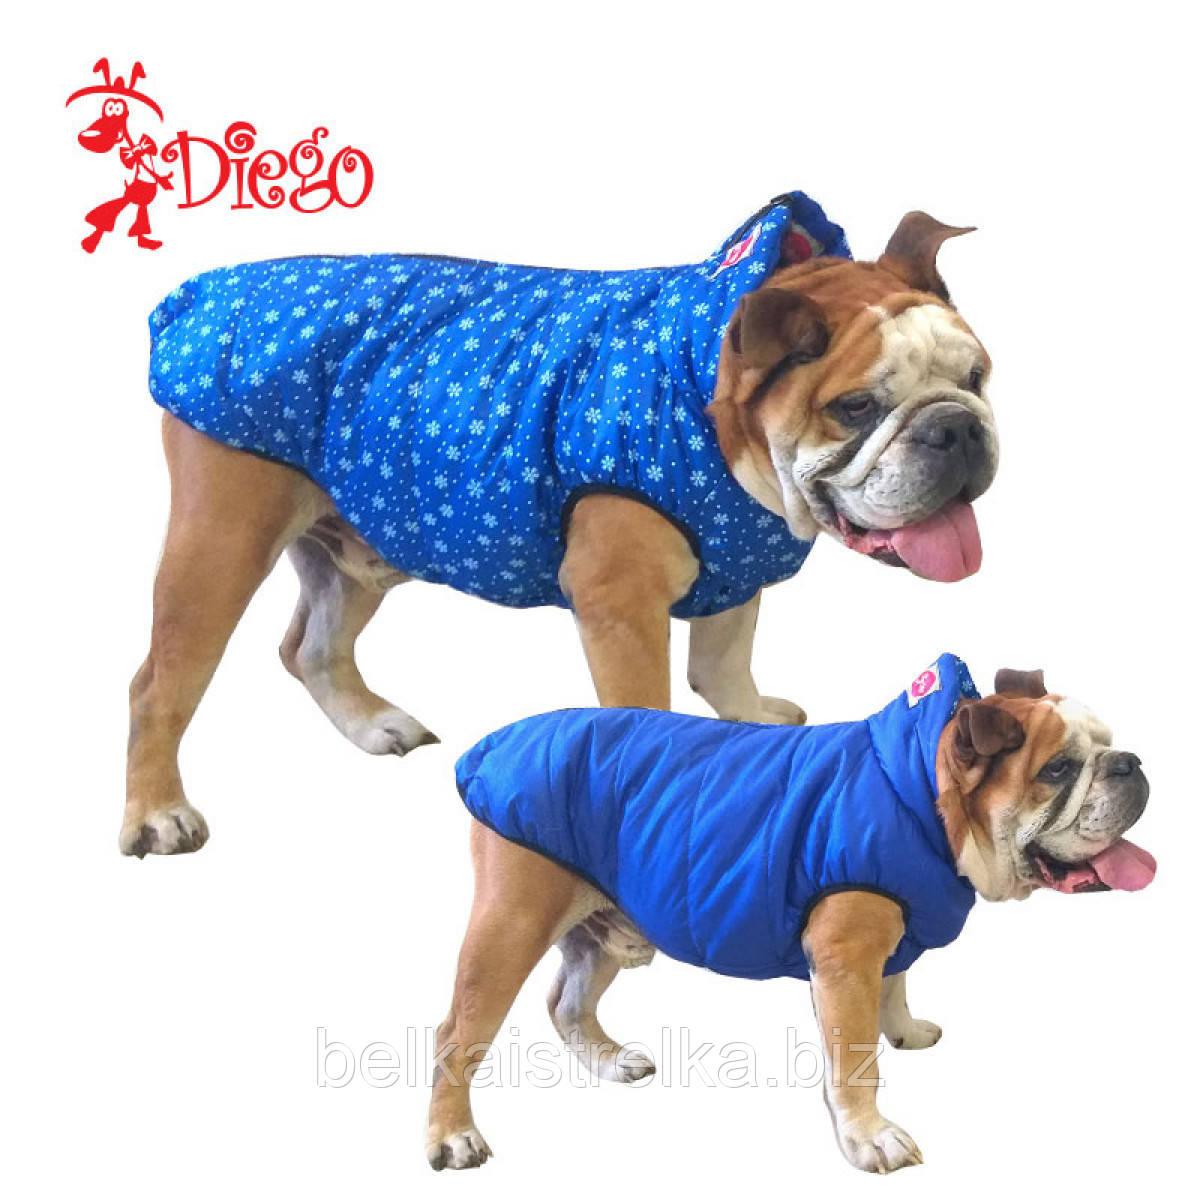 Жилет для собаки двухсторонний DIEGO sport double 4/9 Снежинки, размер 4